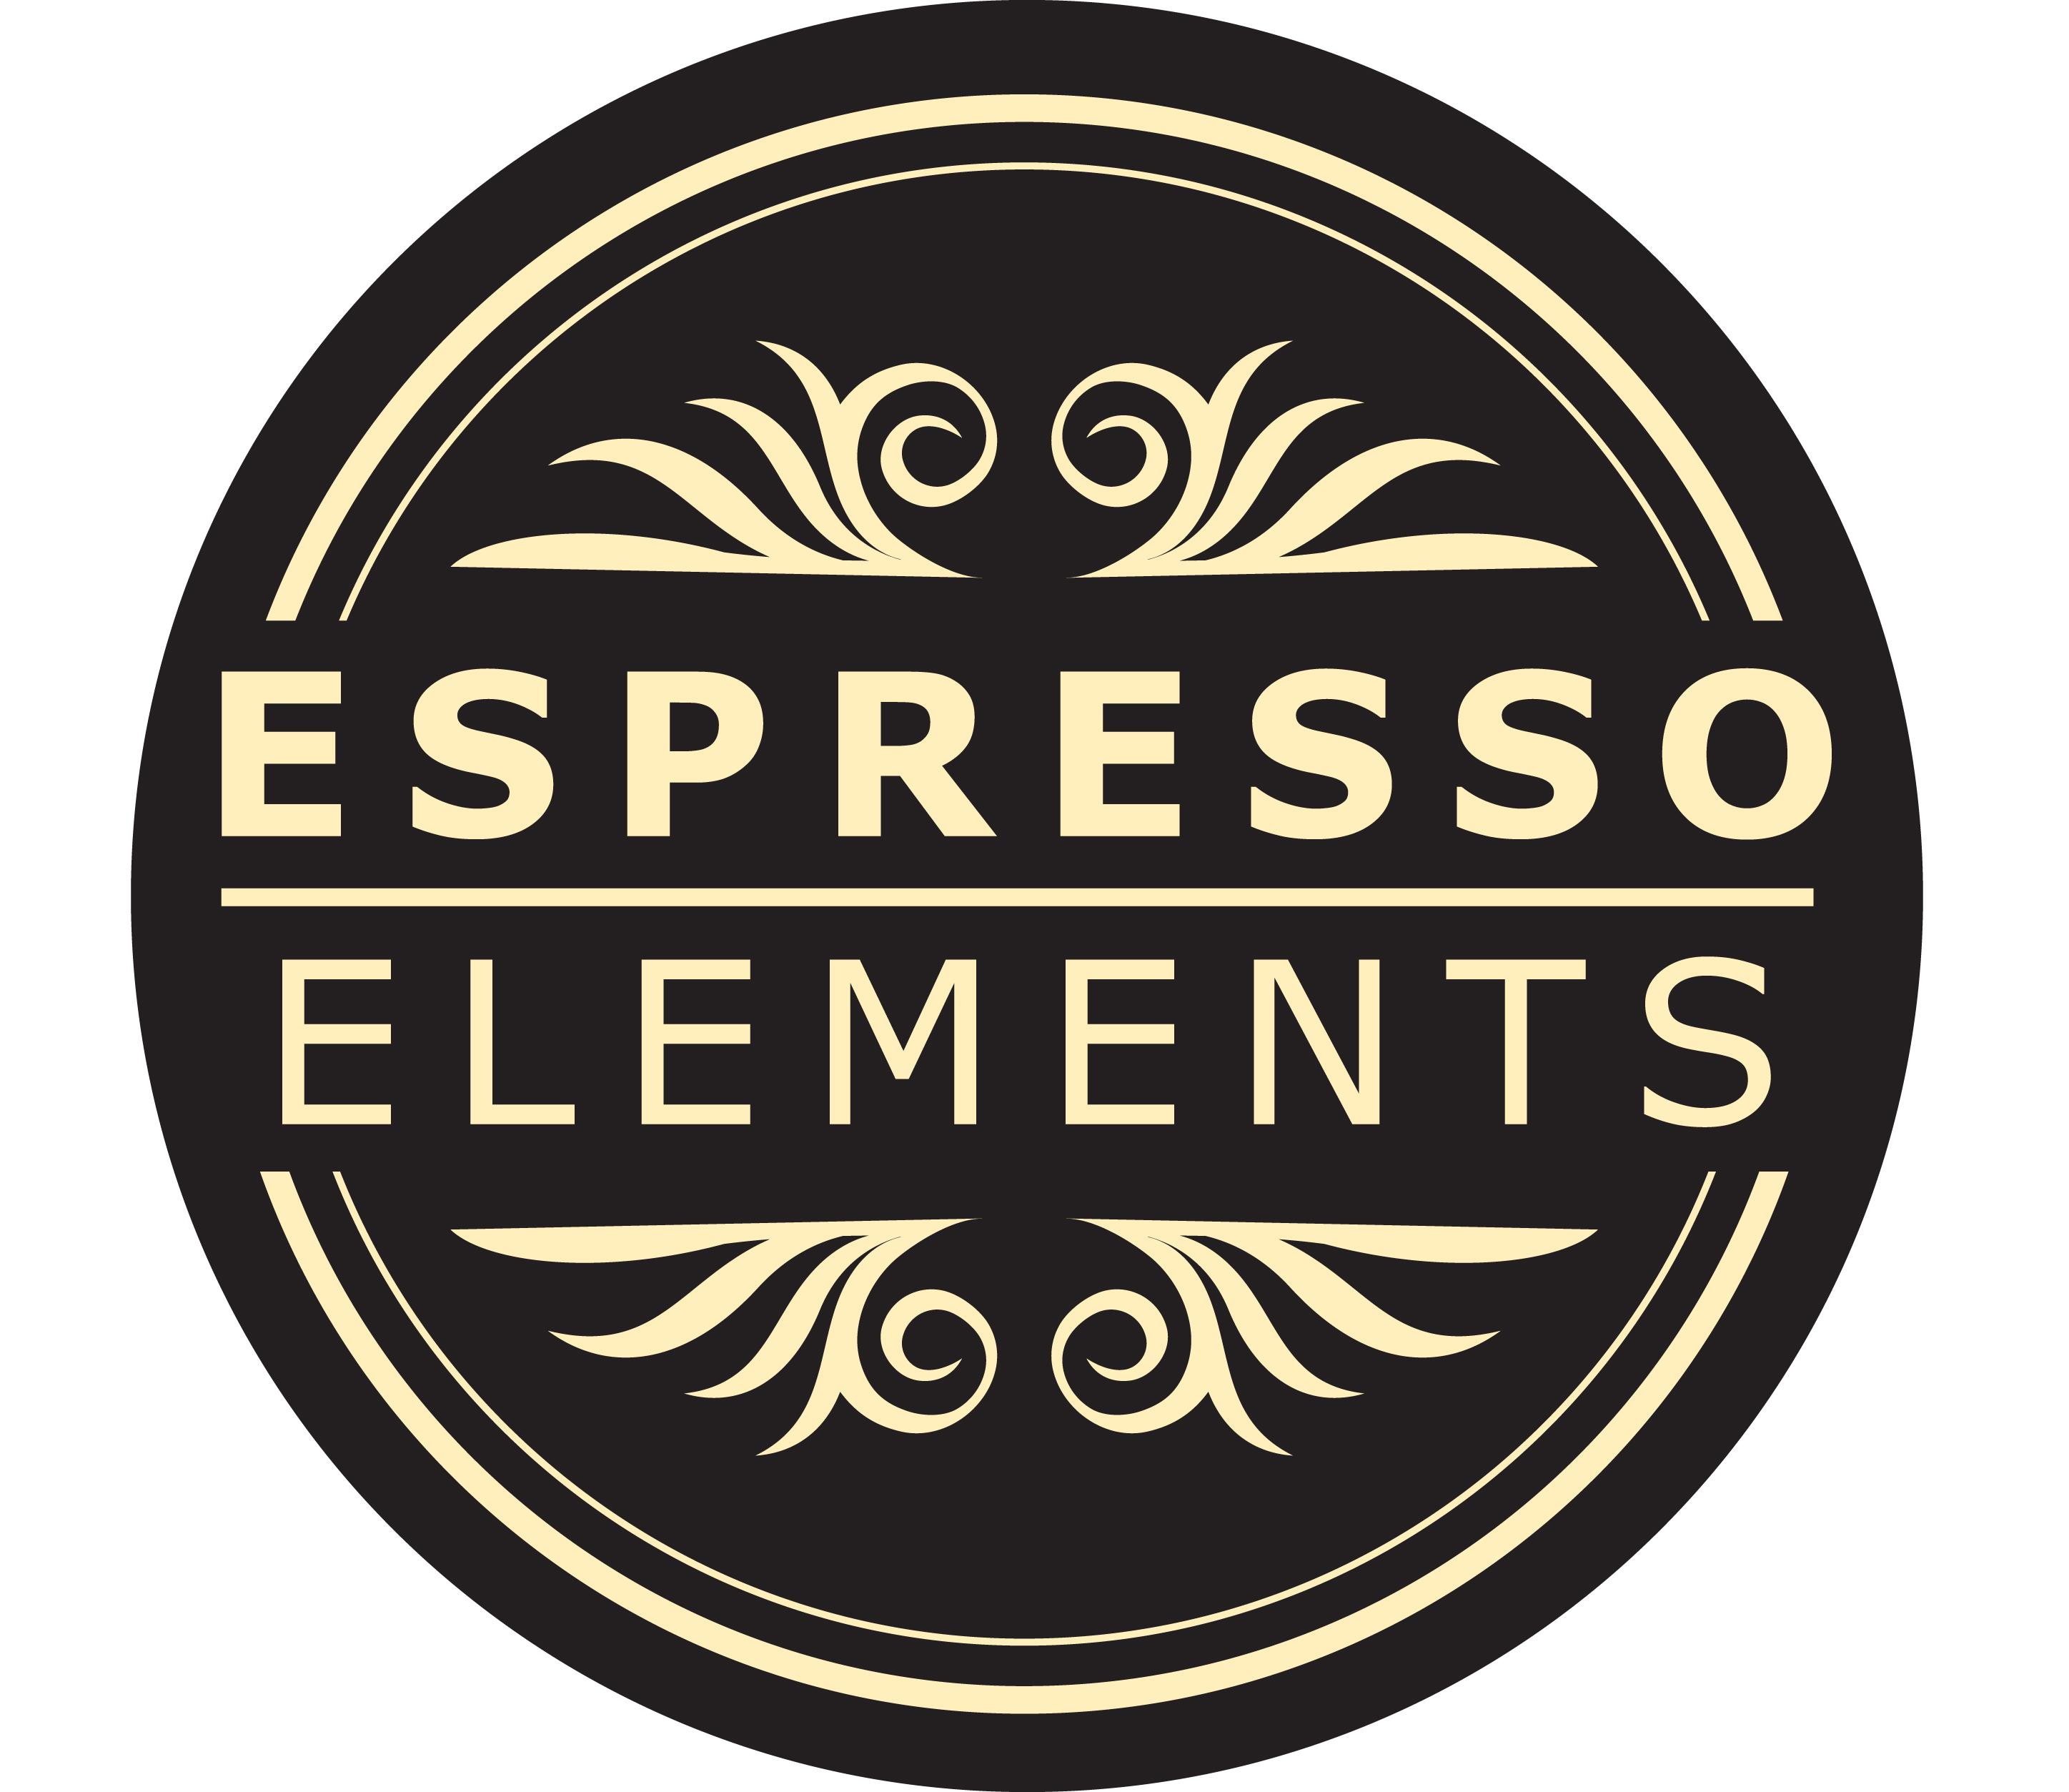 ESPRESSO ELEMENTS Logo